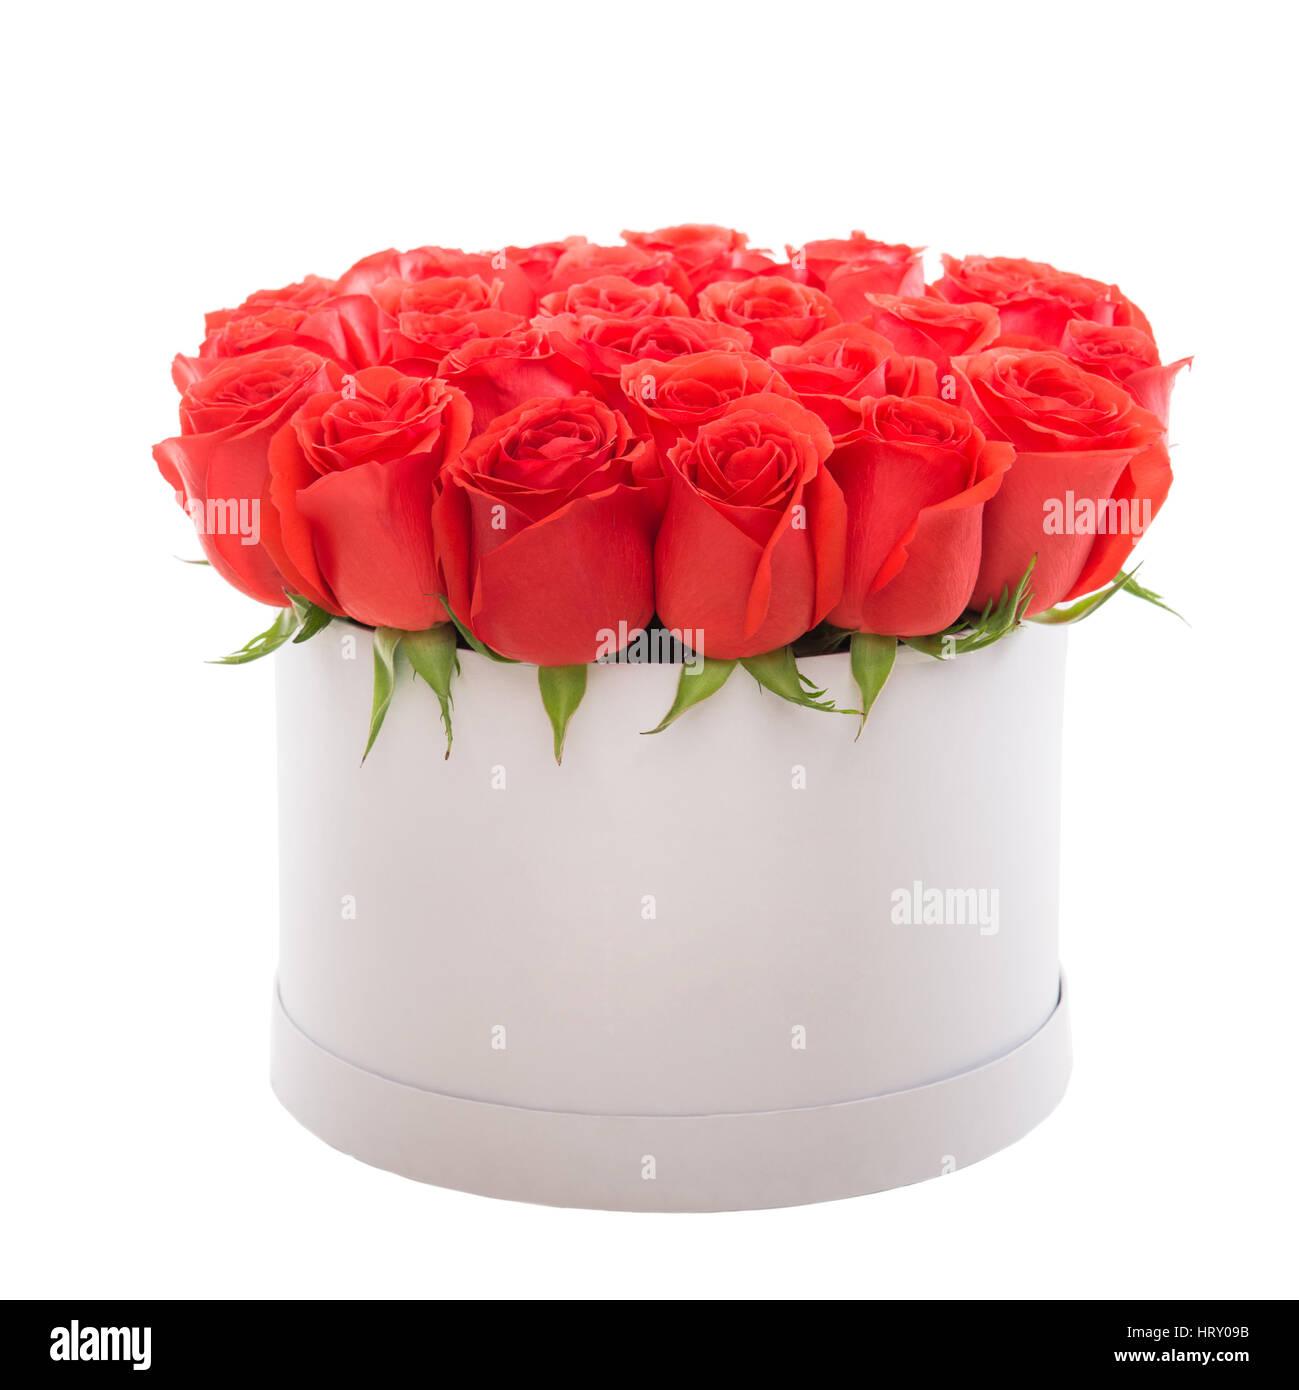 Red roses in white luxury present box flower box stock photo red roses in white luxury present box flower box mightylinksfo